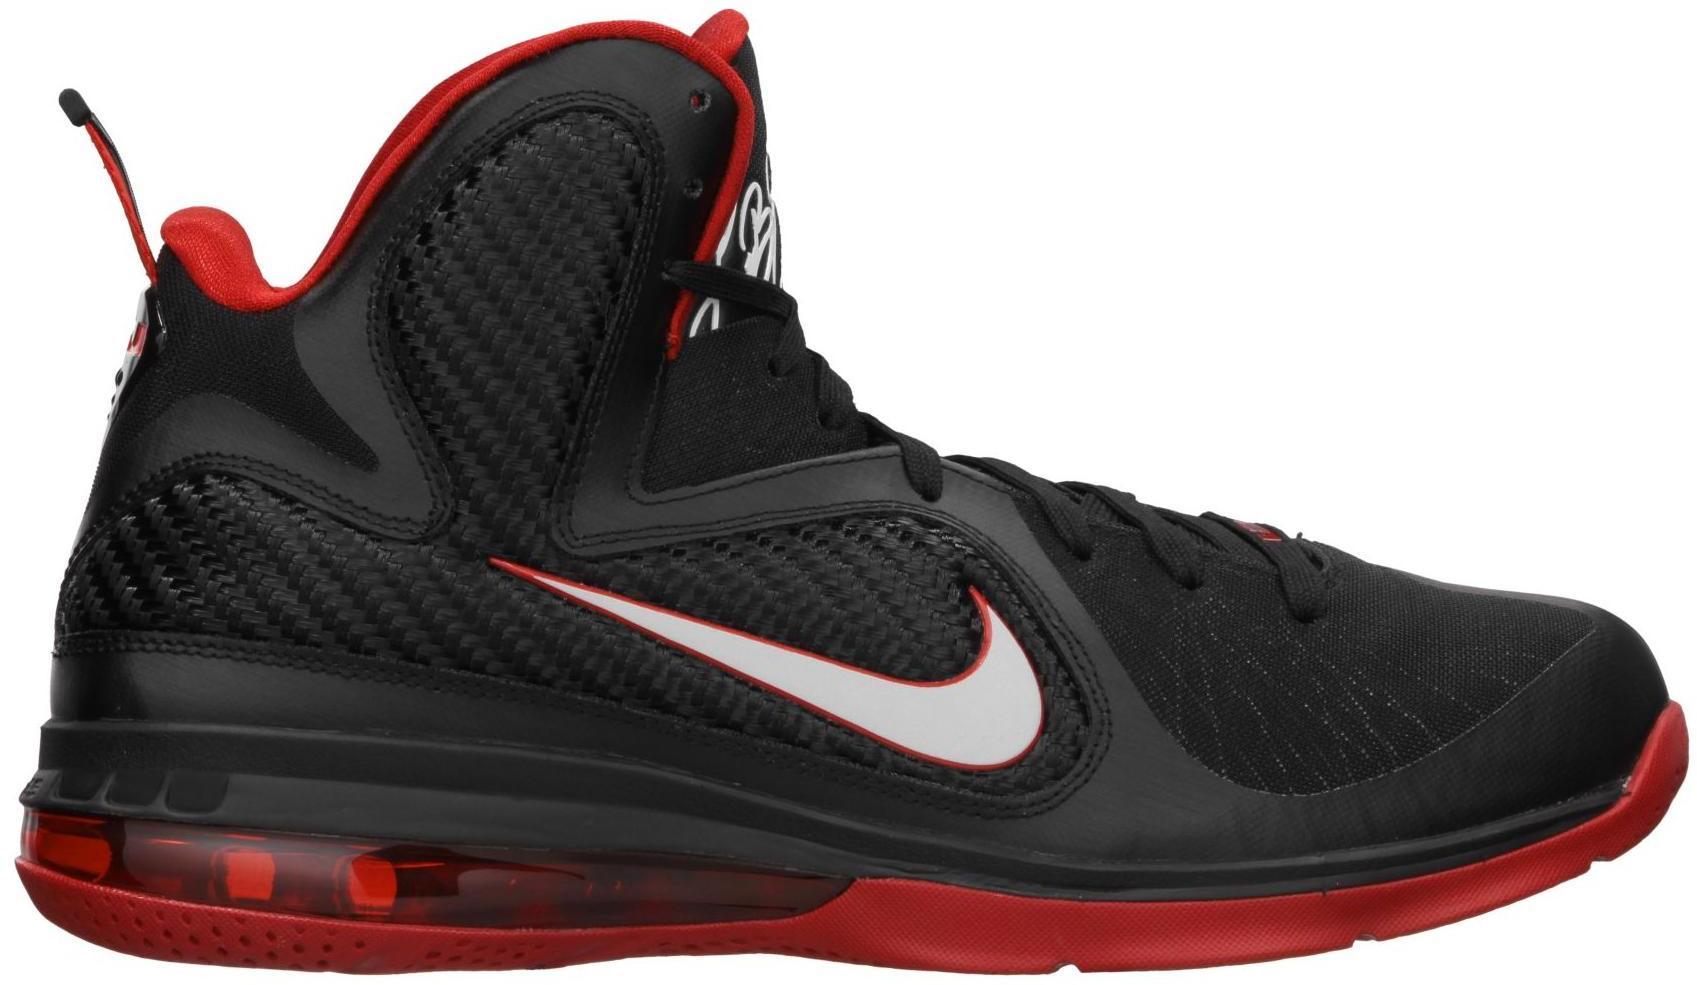 Nike LeBron 9 Miami Heat Away - 469764-003